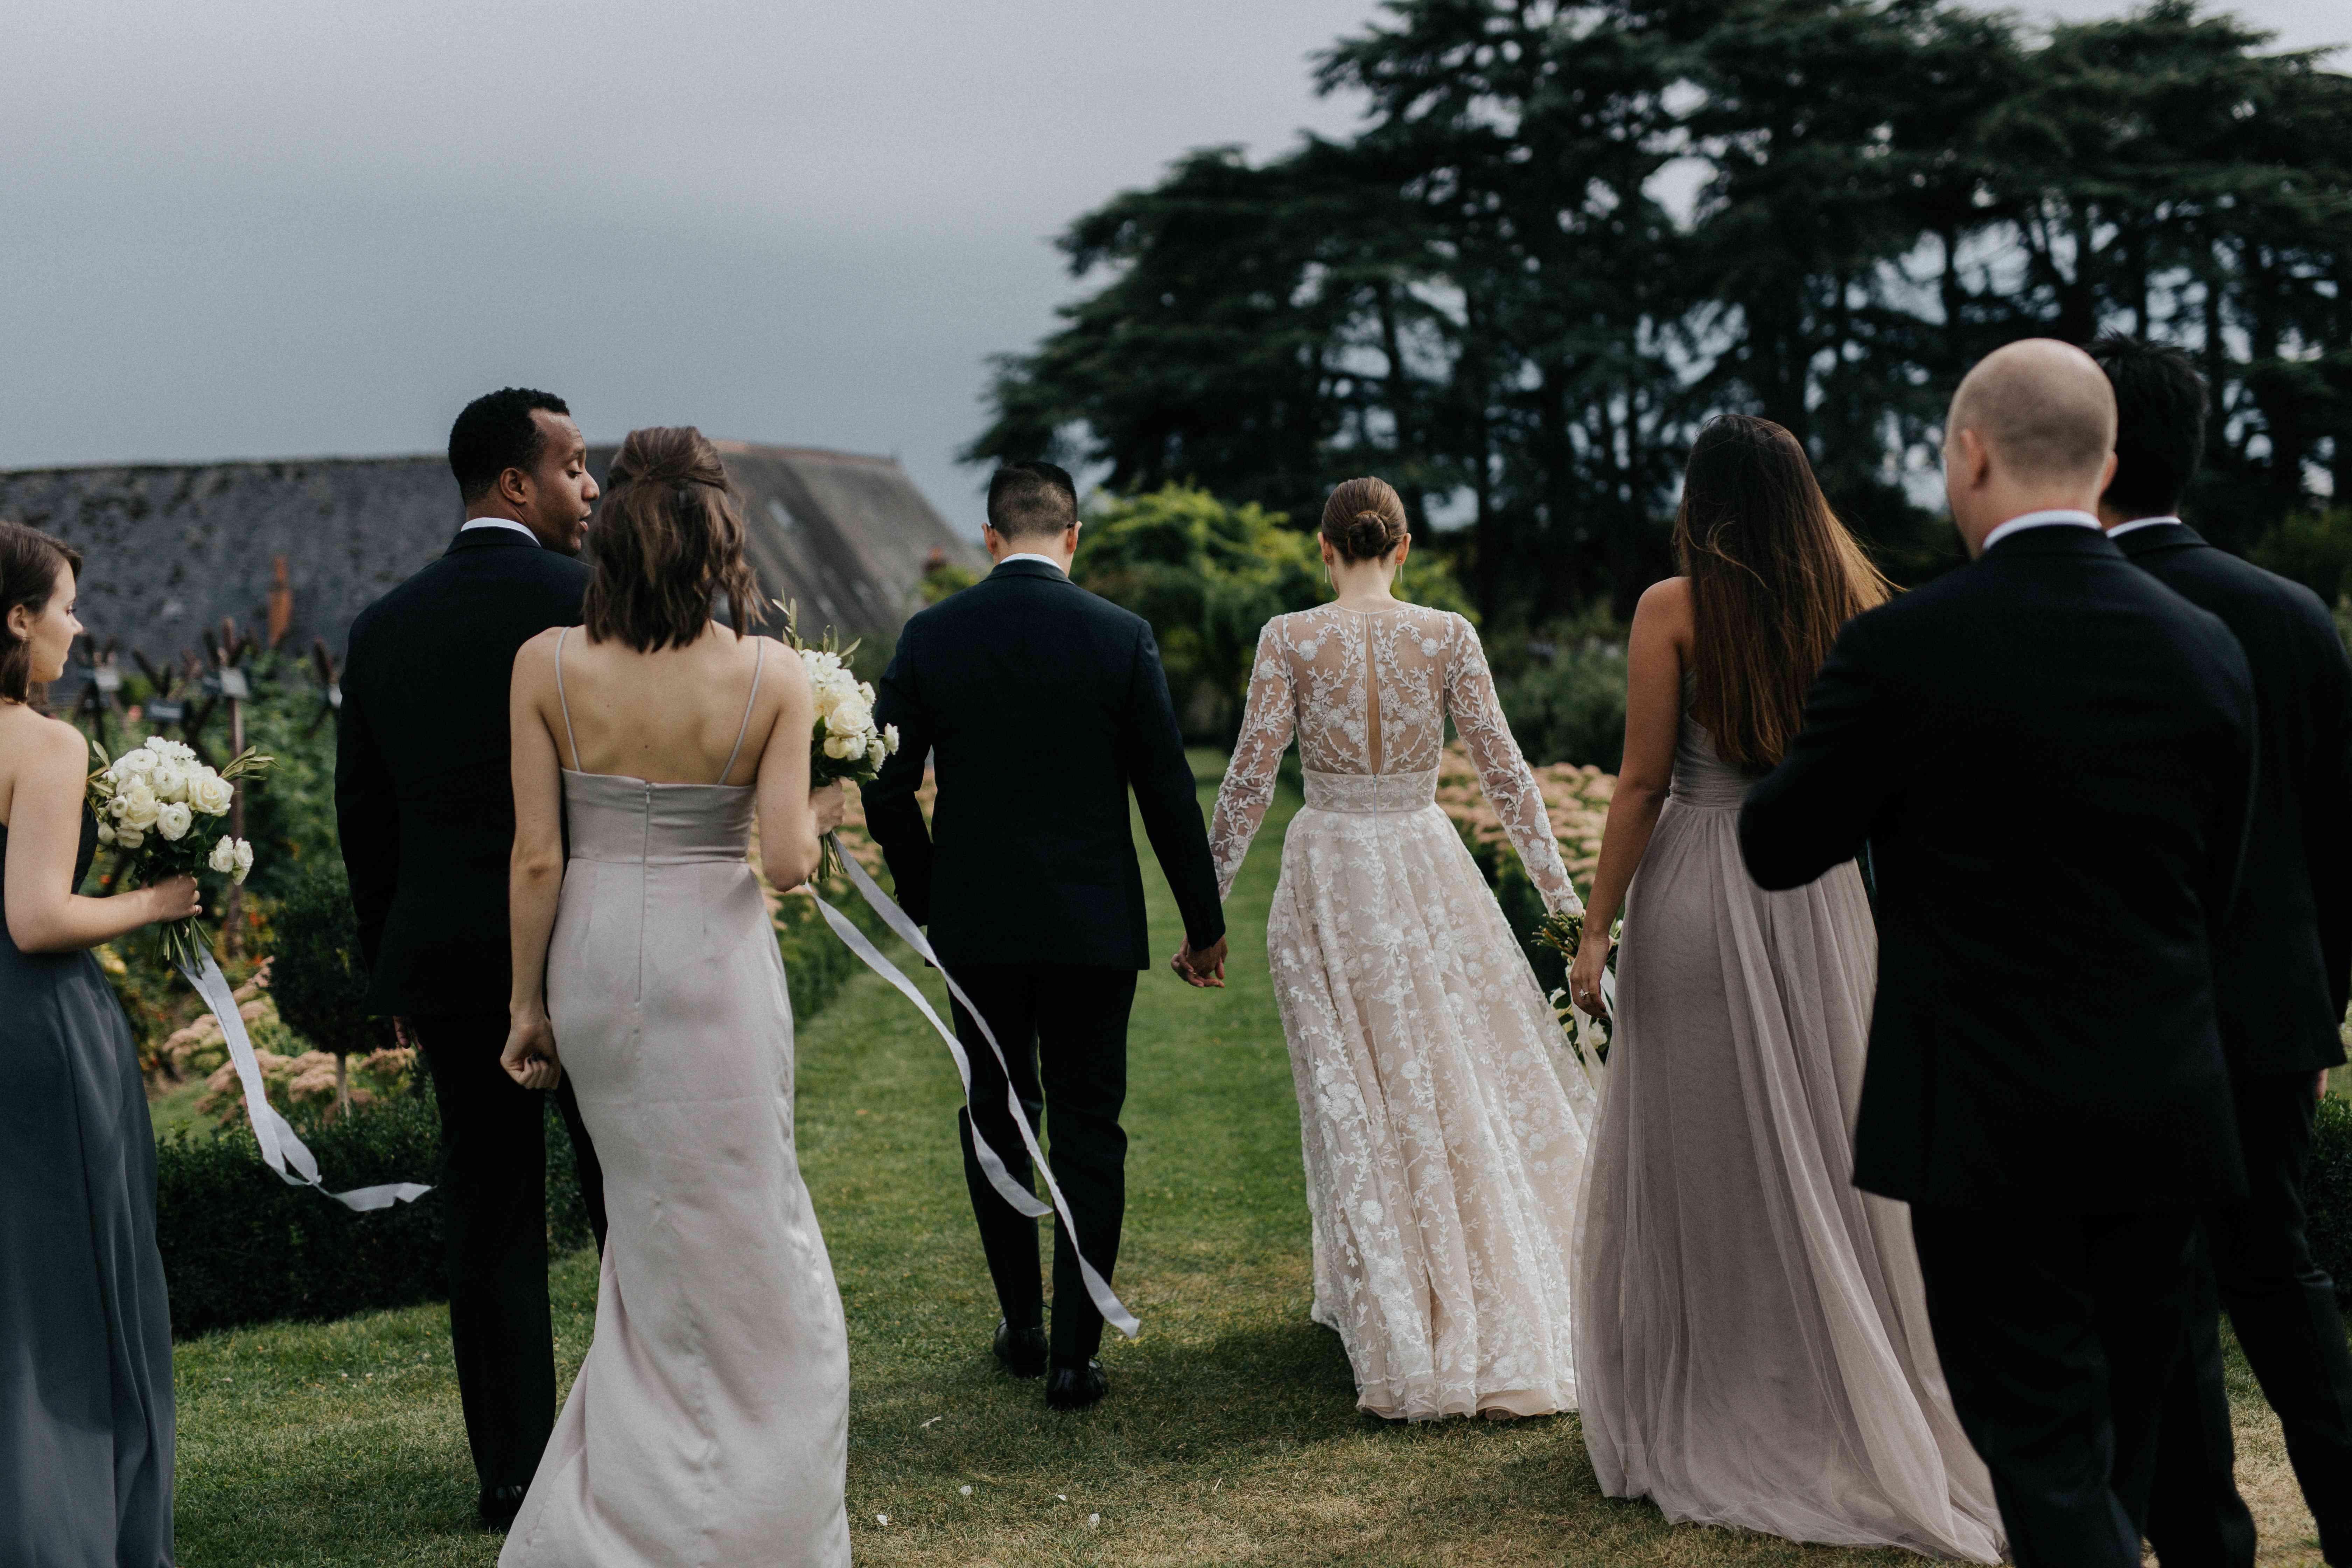 <p>bridesmaids and groomsman</p><br><br>